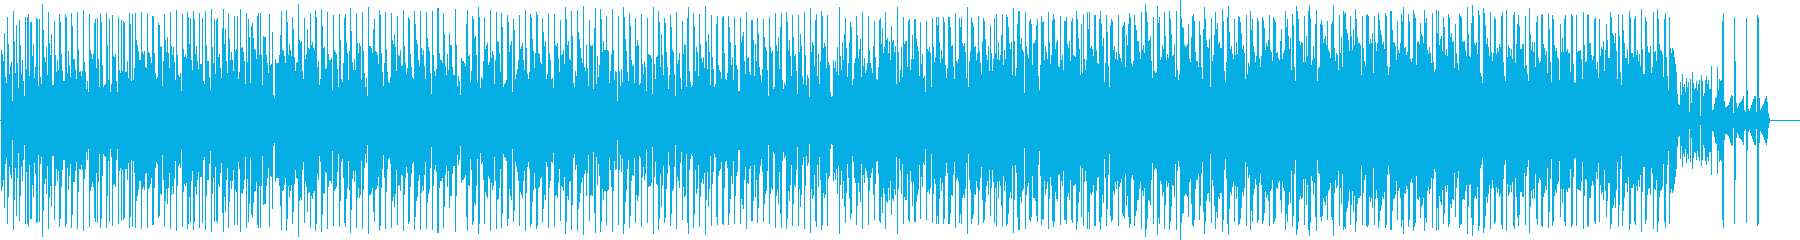 estp_tenth_b9の再生済みの波形